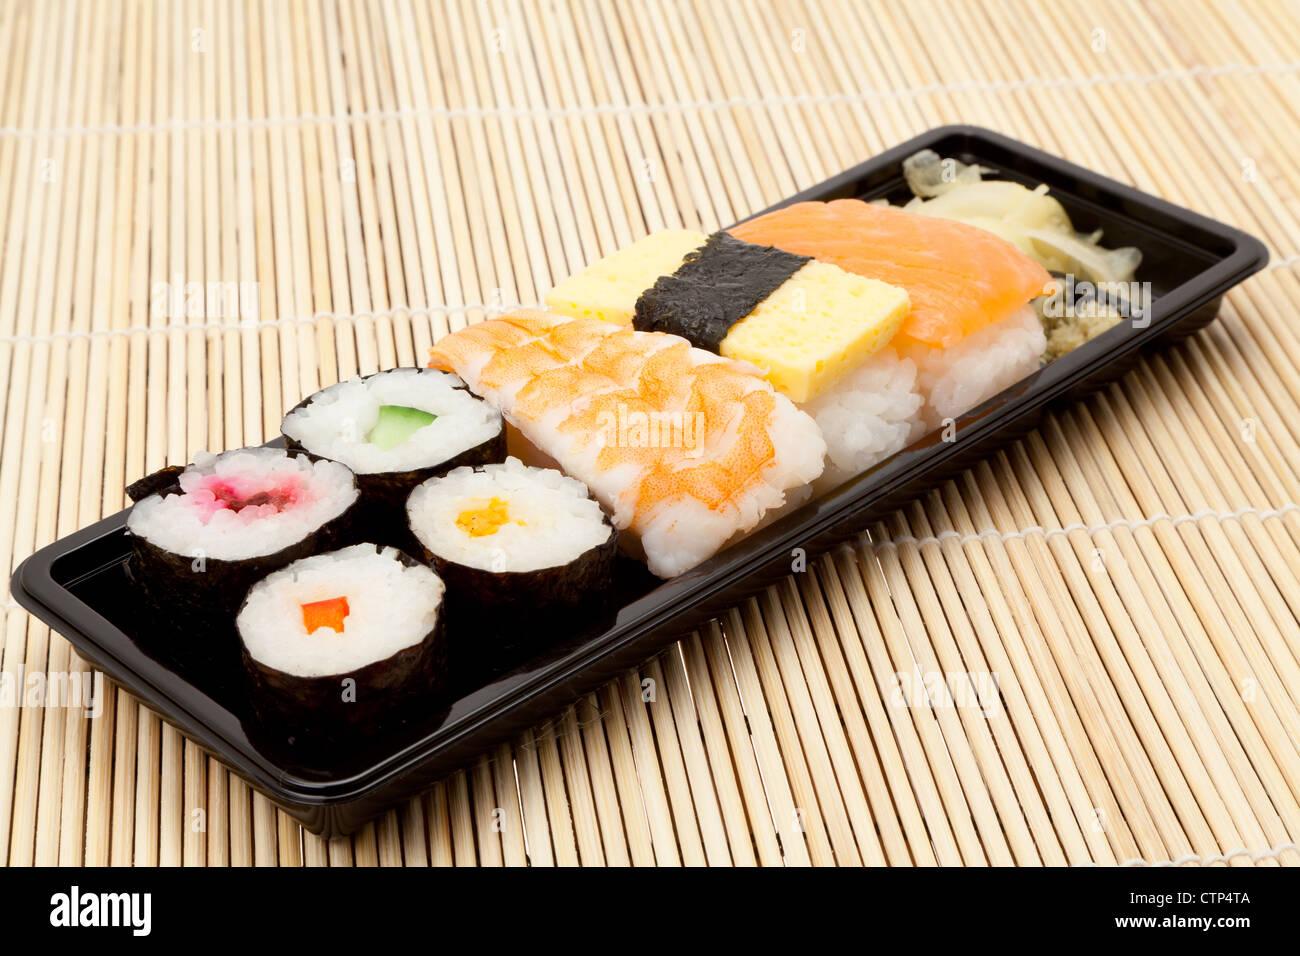 Bandeja de sushi de diferentes elementos en un lugar mat - Foto de estudio Imagen De Stock